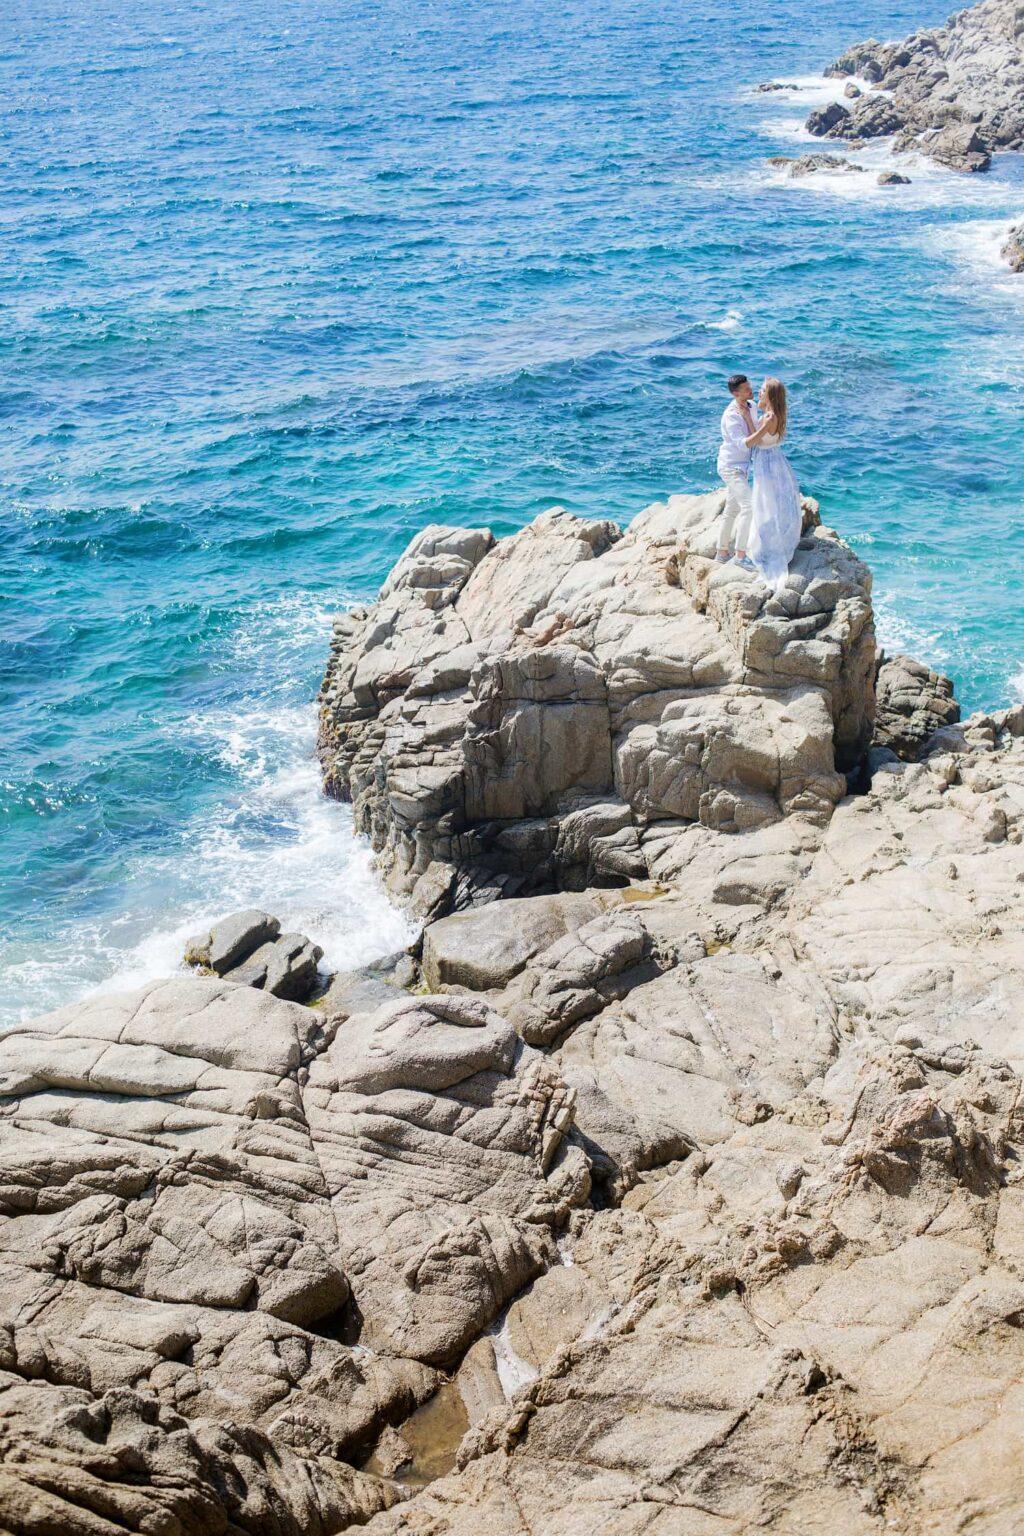 Hochzeitsreise Barcelona, romantische Verlobung Spanien, After Wedding Shooting in Tossa del Mar